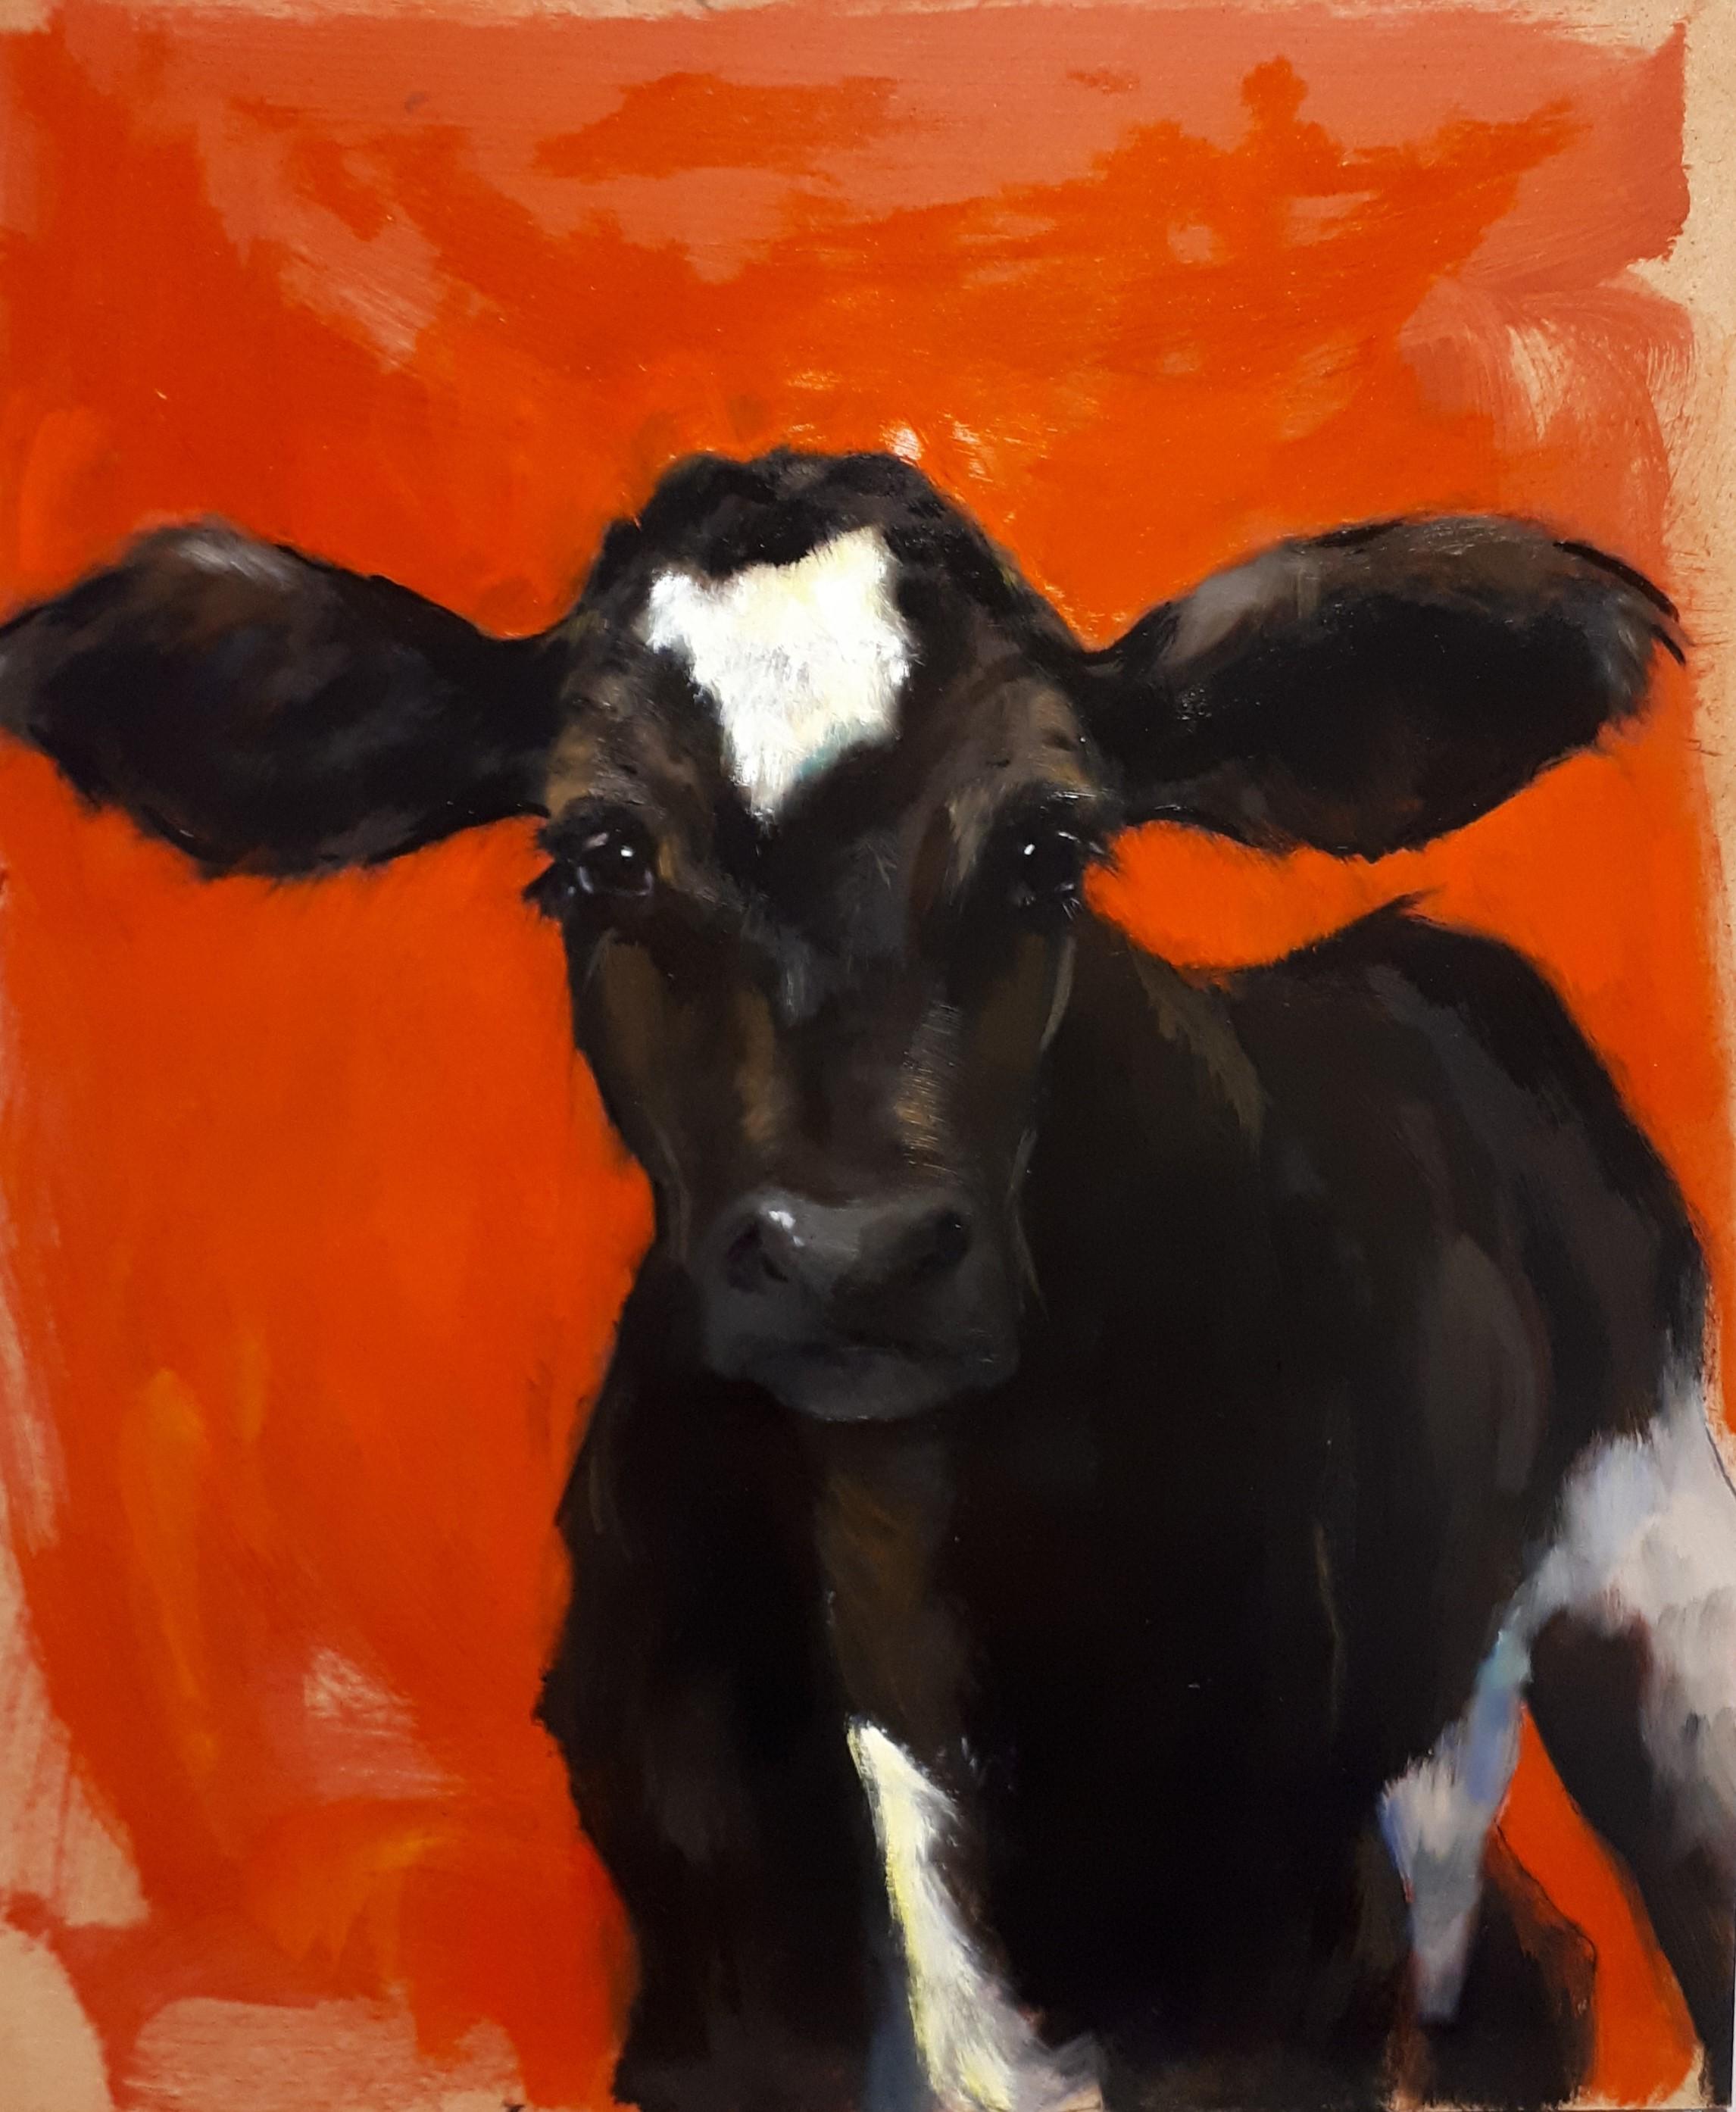 Calf Killeri